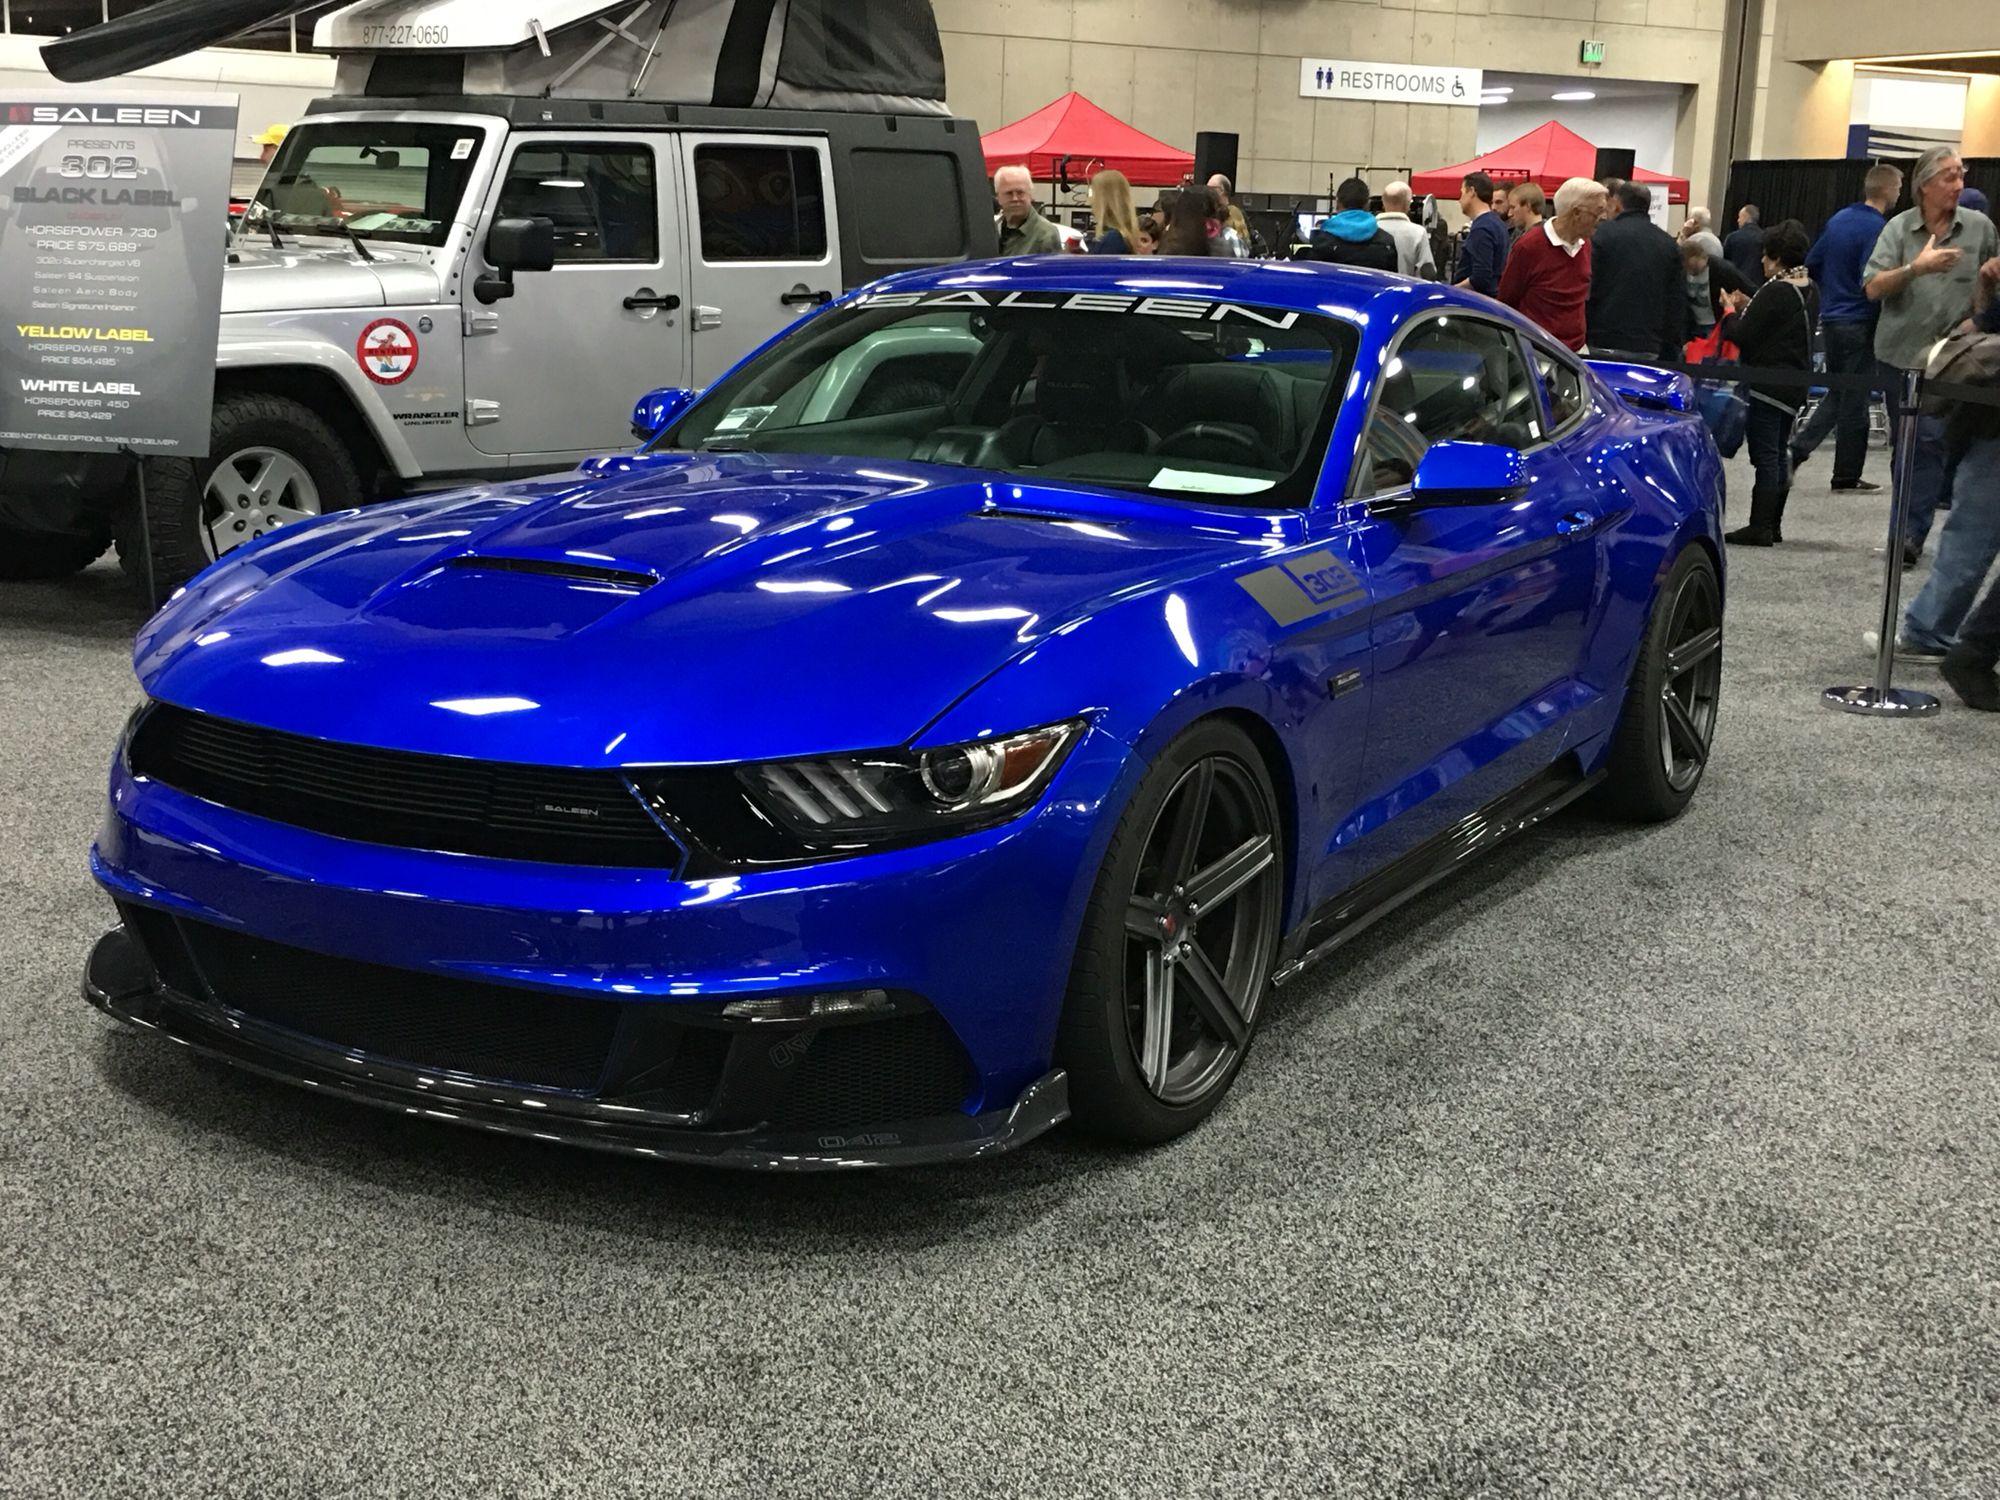 2016 Saleen Mustang >> 2016 Saleen International Auto Show San Diego Ca 1 1 16 Cars